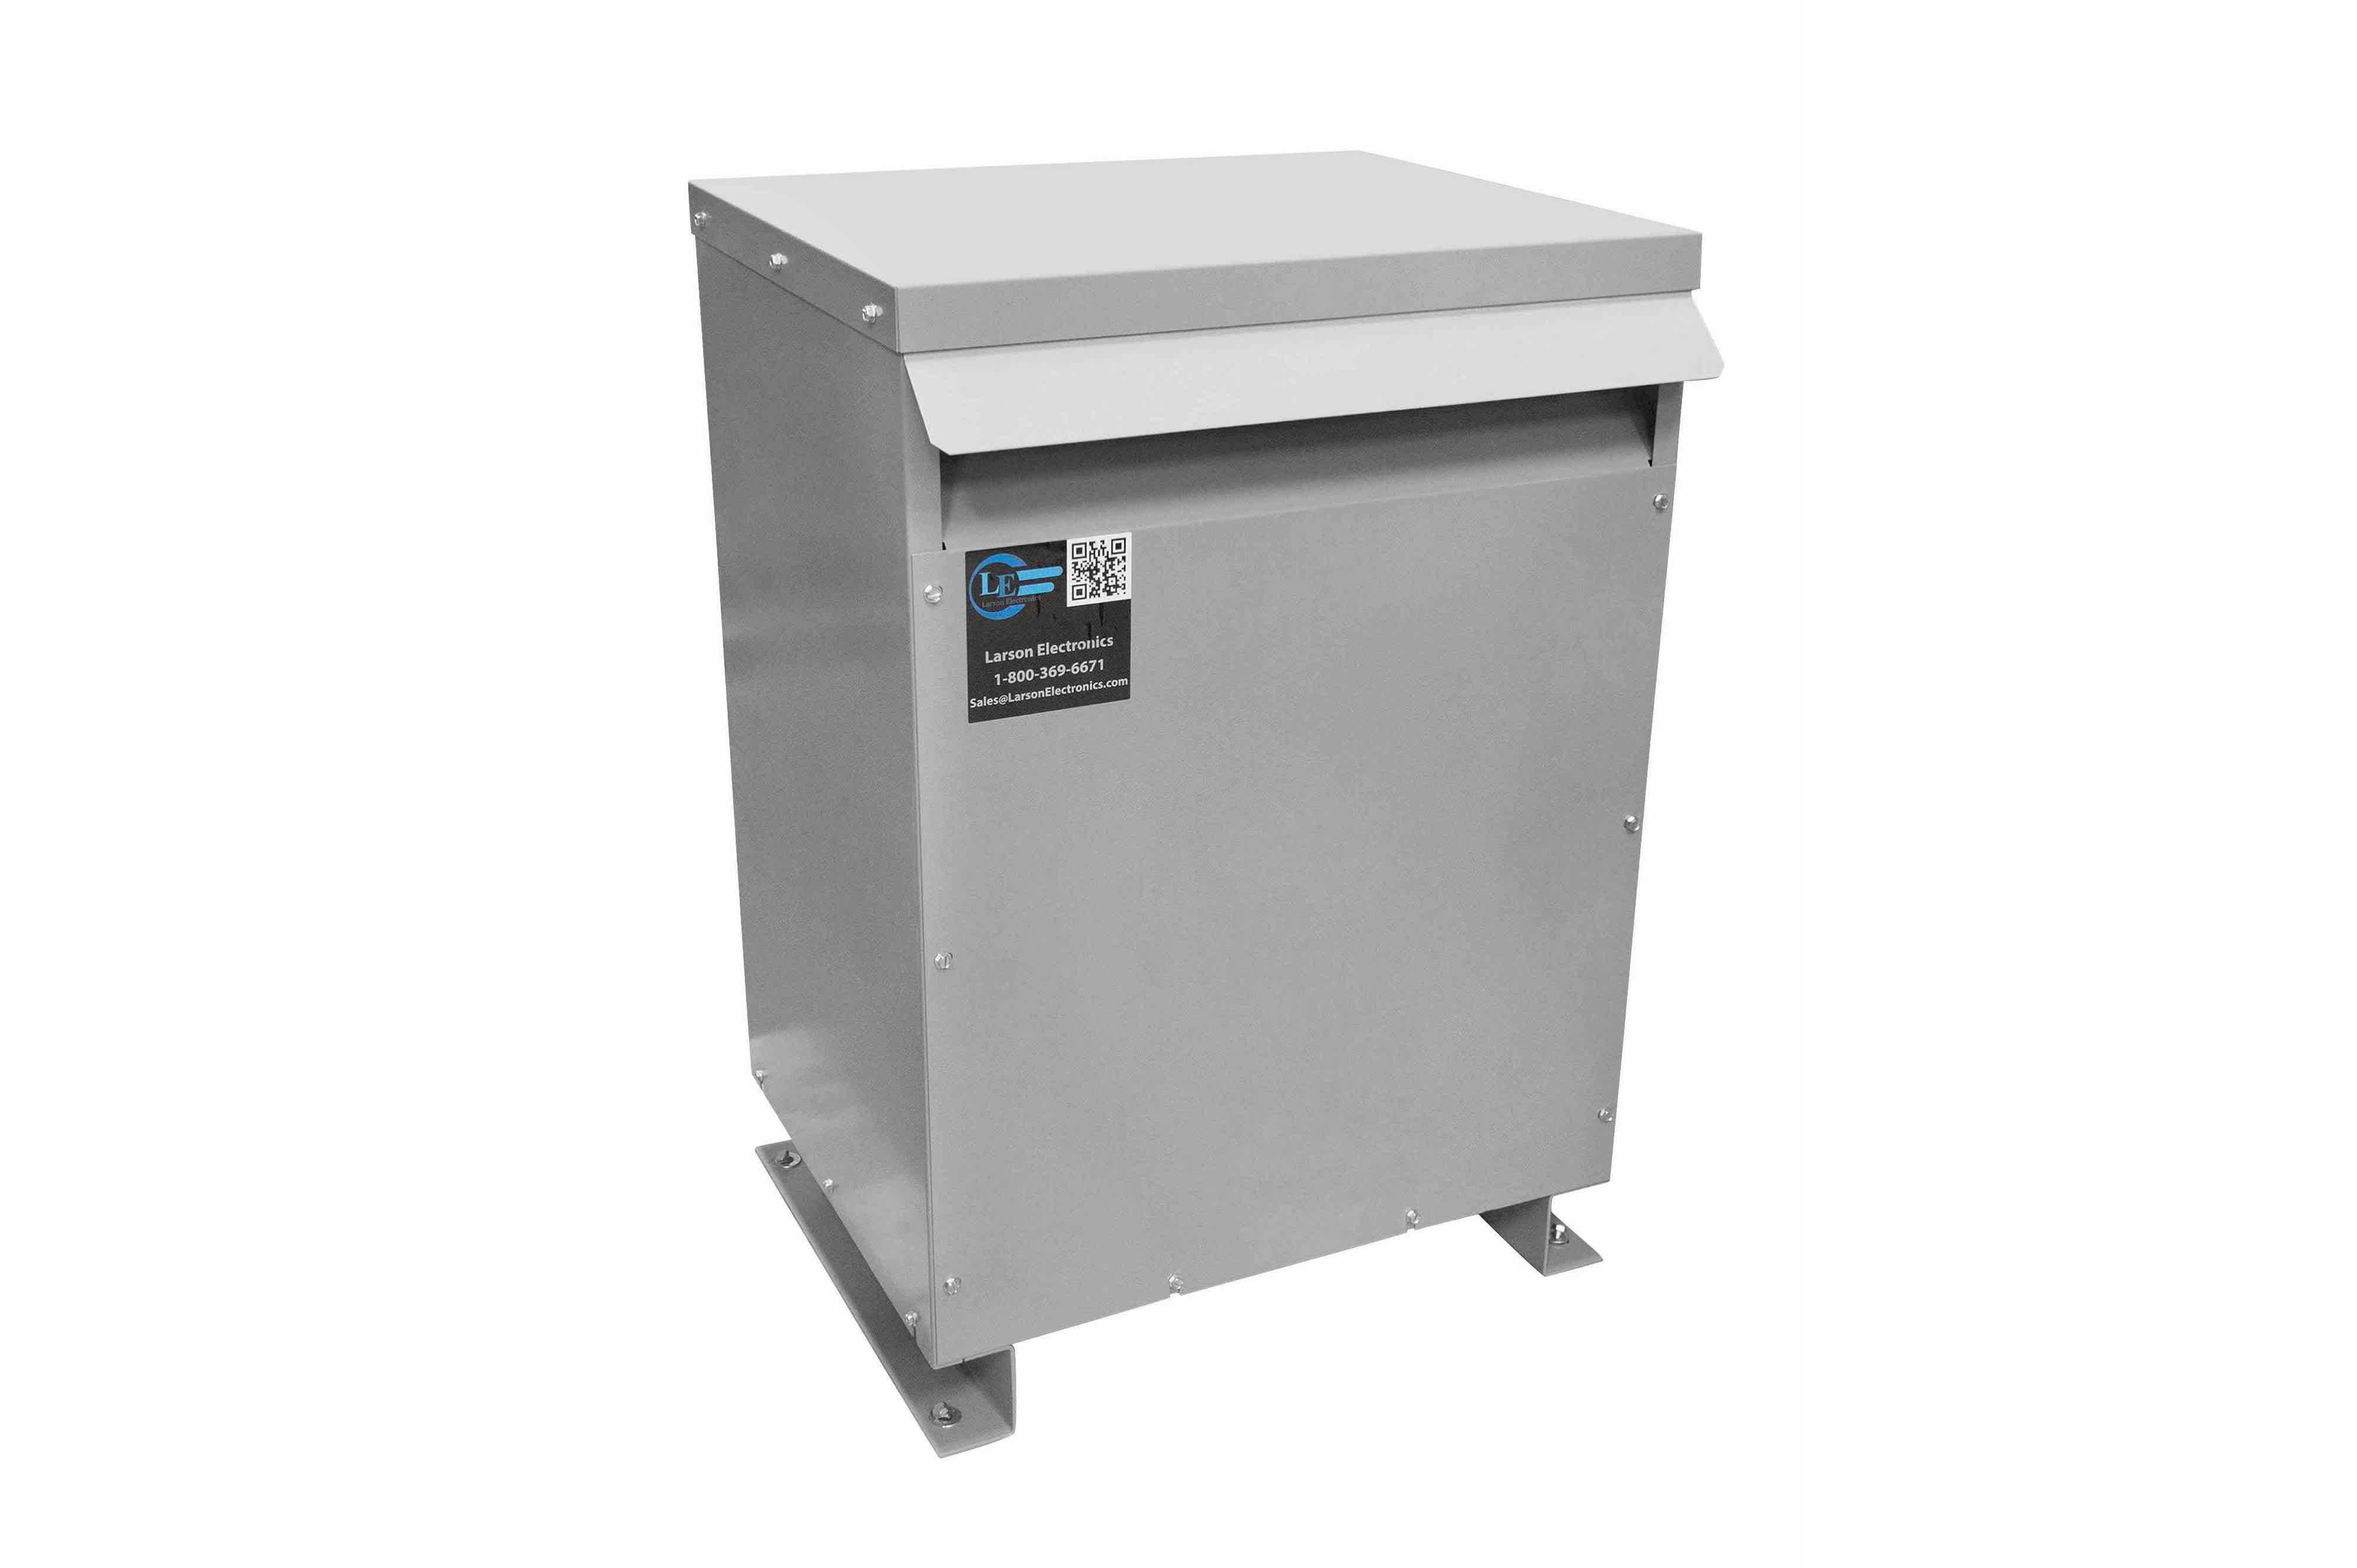 800 kVA 3PH DOE Transformer, 240V Delta Primary, 380Y/220 Wye-N Secondary, N3R, Ventilated, 60 Hz